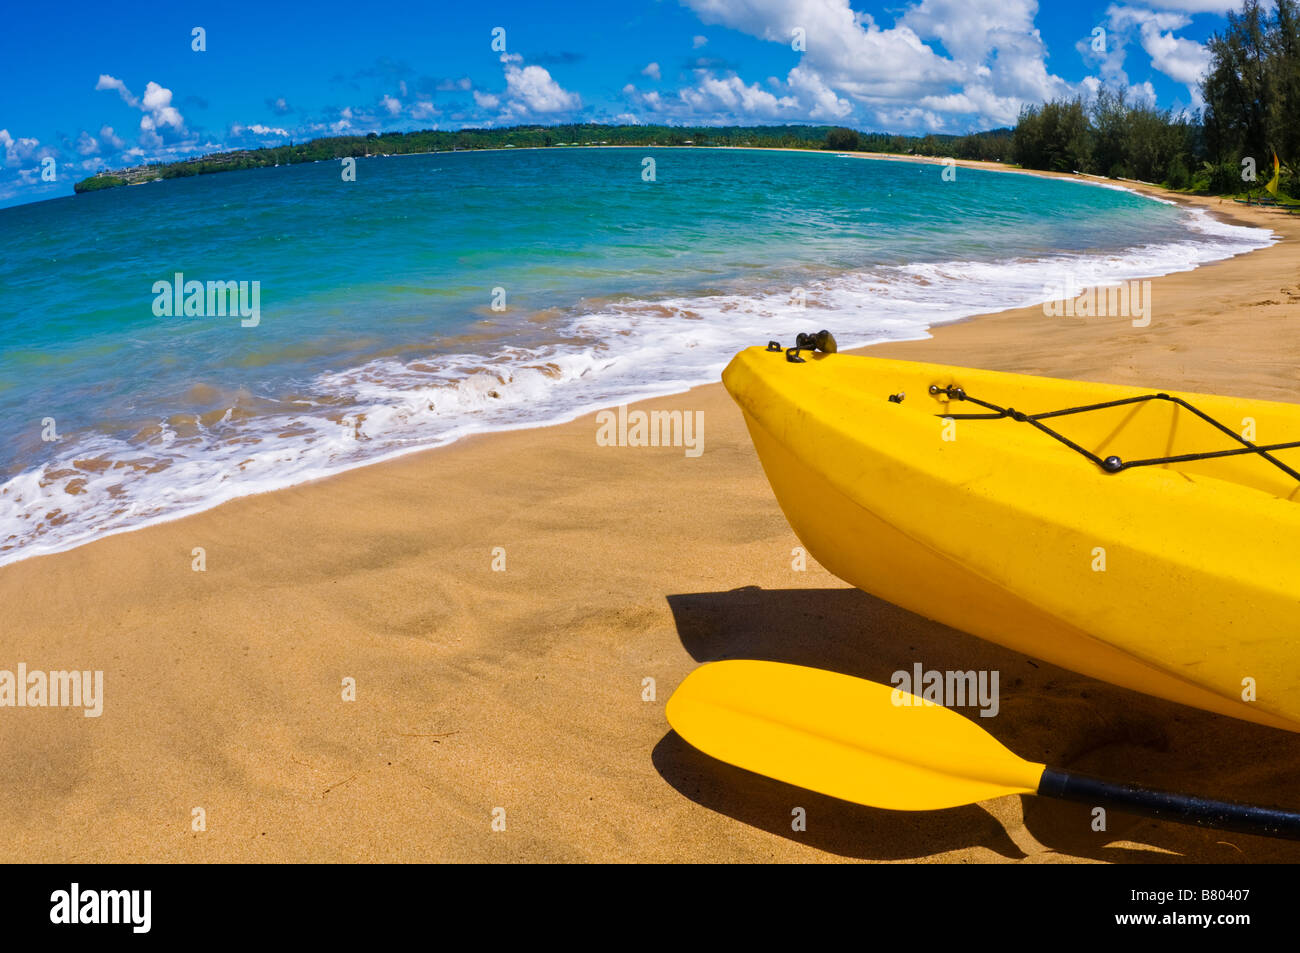 Kayak and paddle on beach on Hanalei Bay Island of Kauai Hawaii - Stock Image